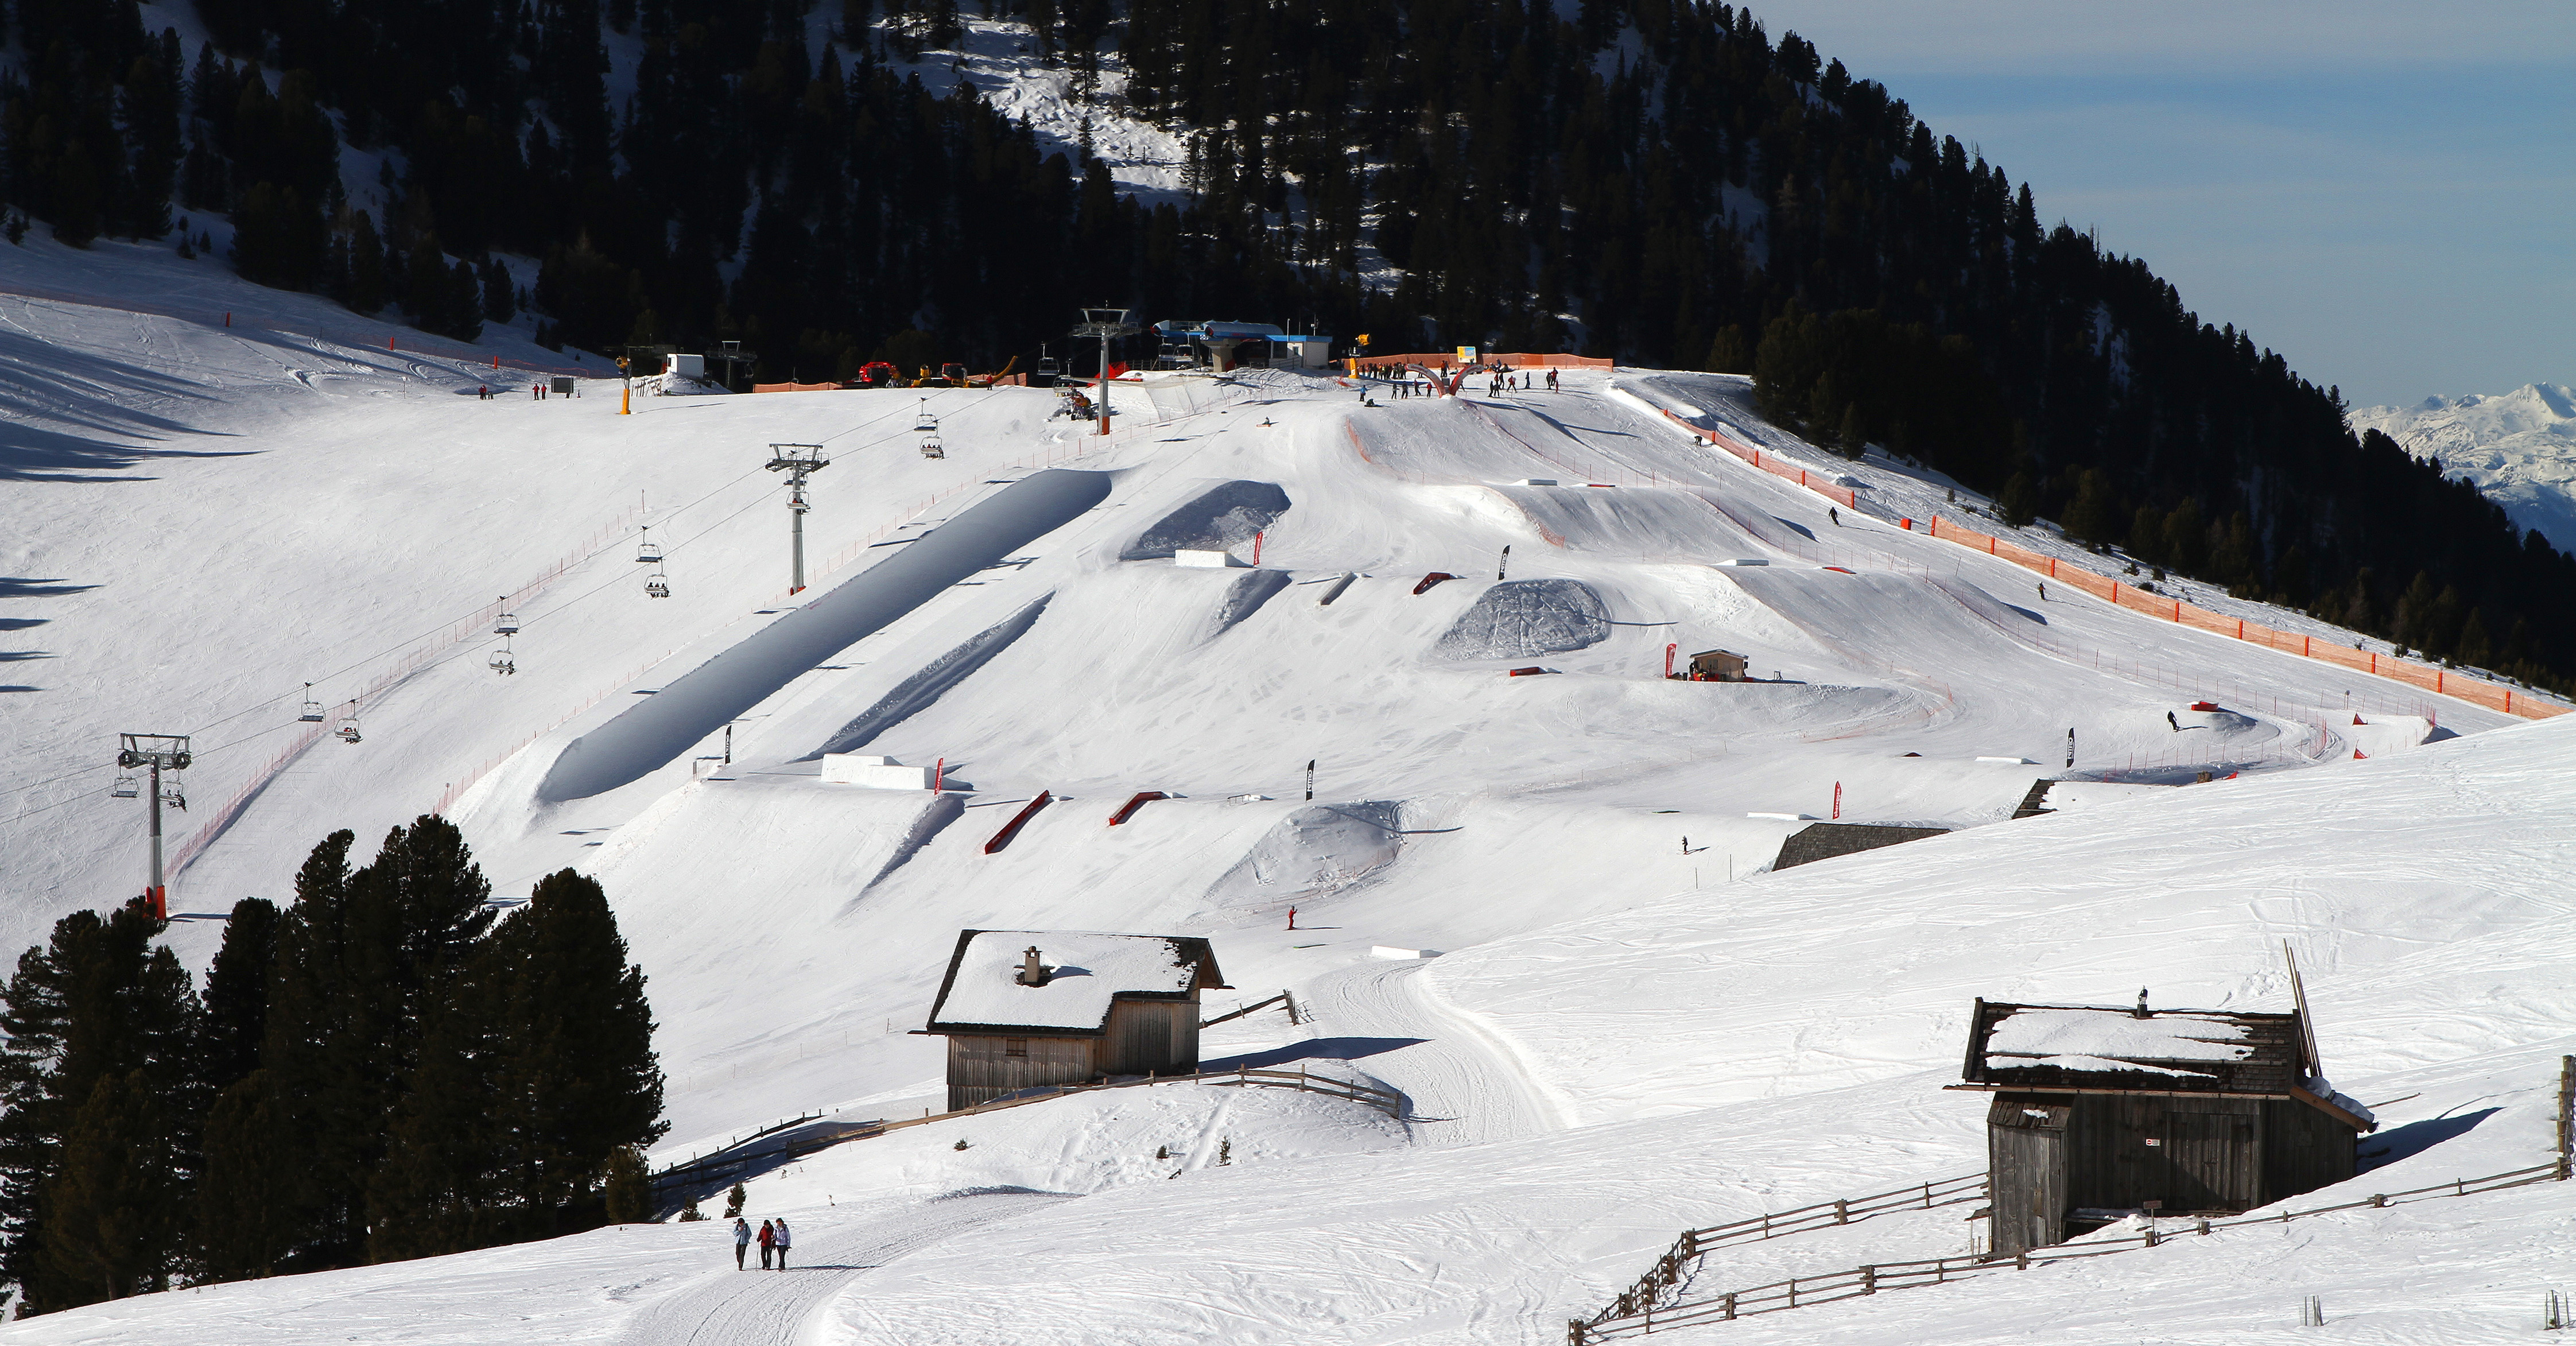 Nova Ponente/Obereggen Οδηγός Χιονοδρομικού Κέντρου